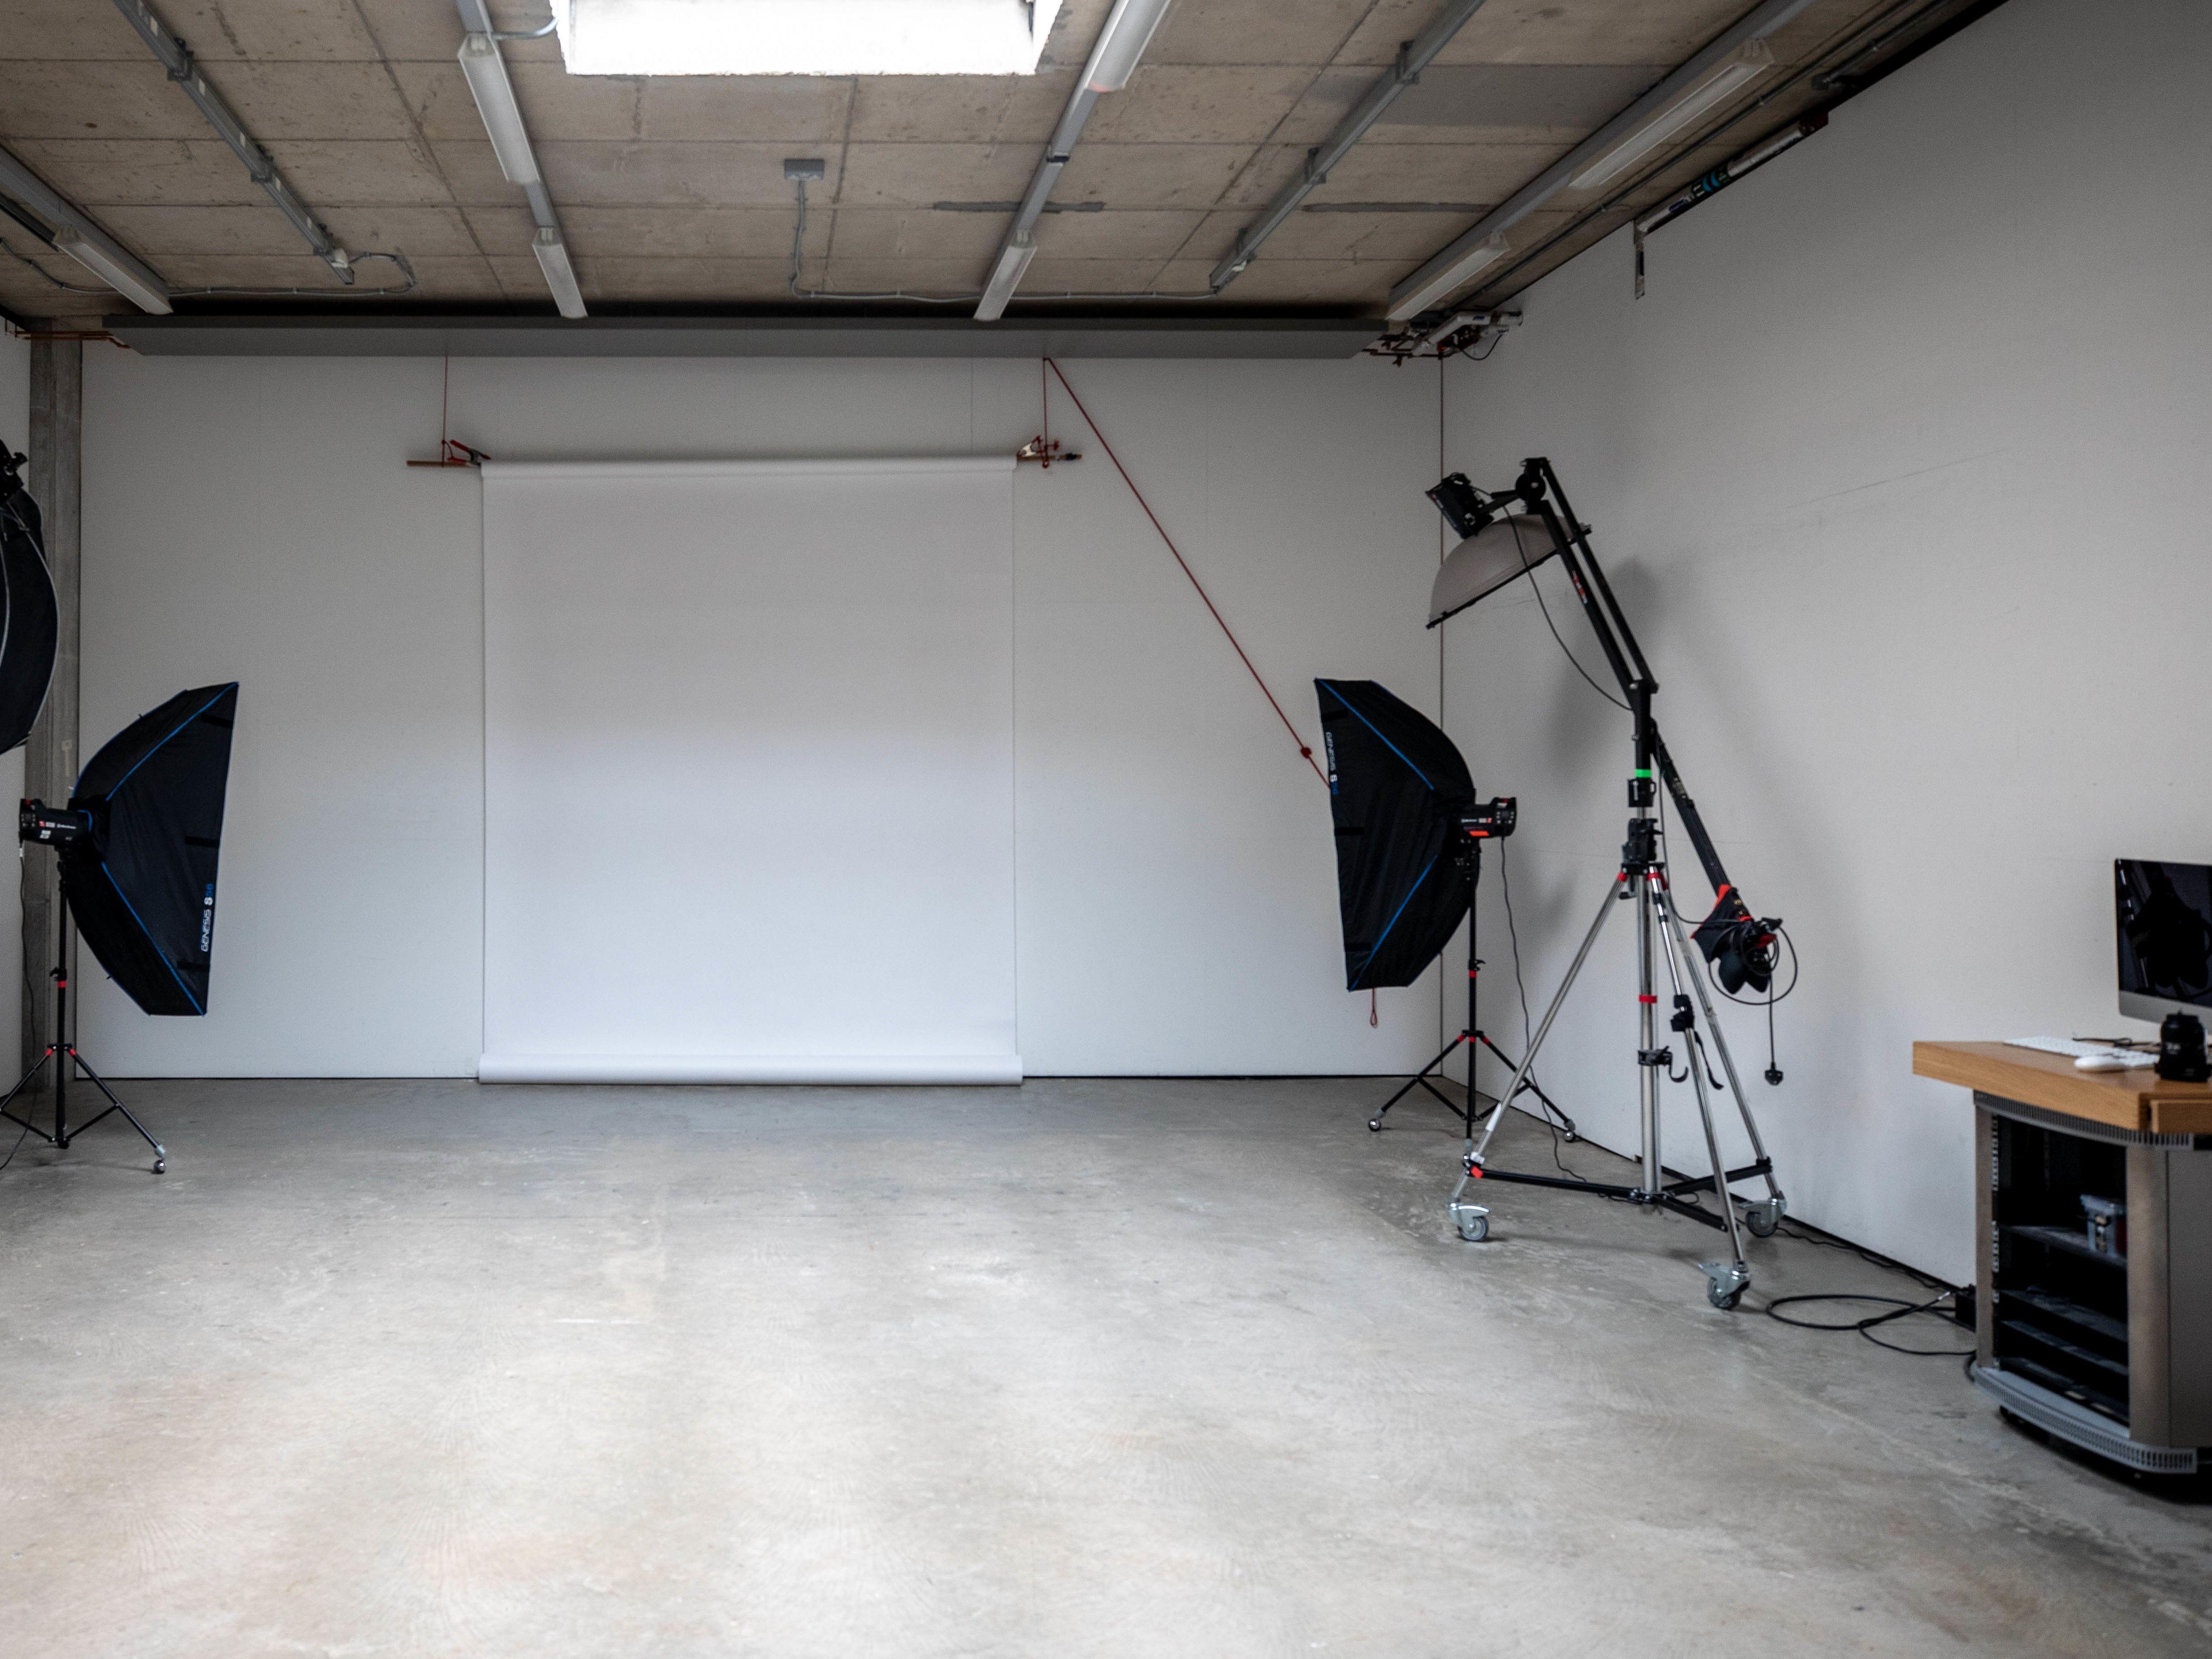 A photography studio